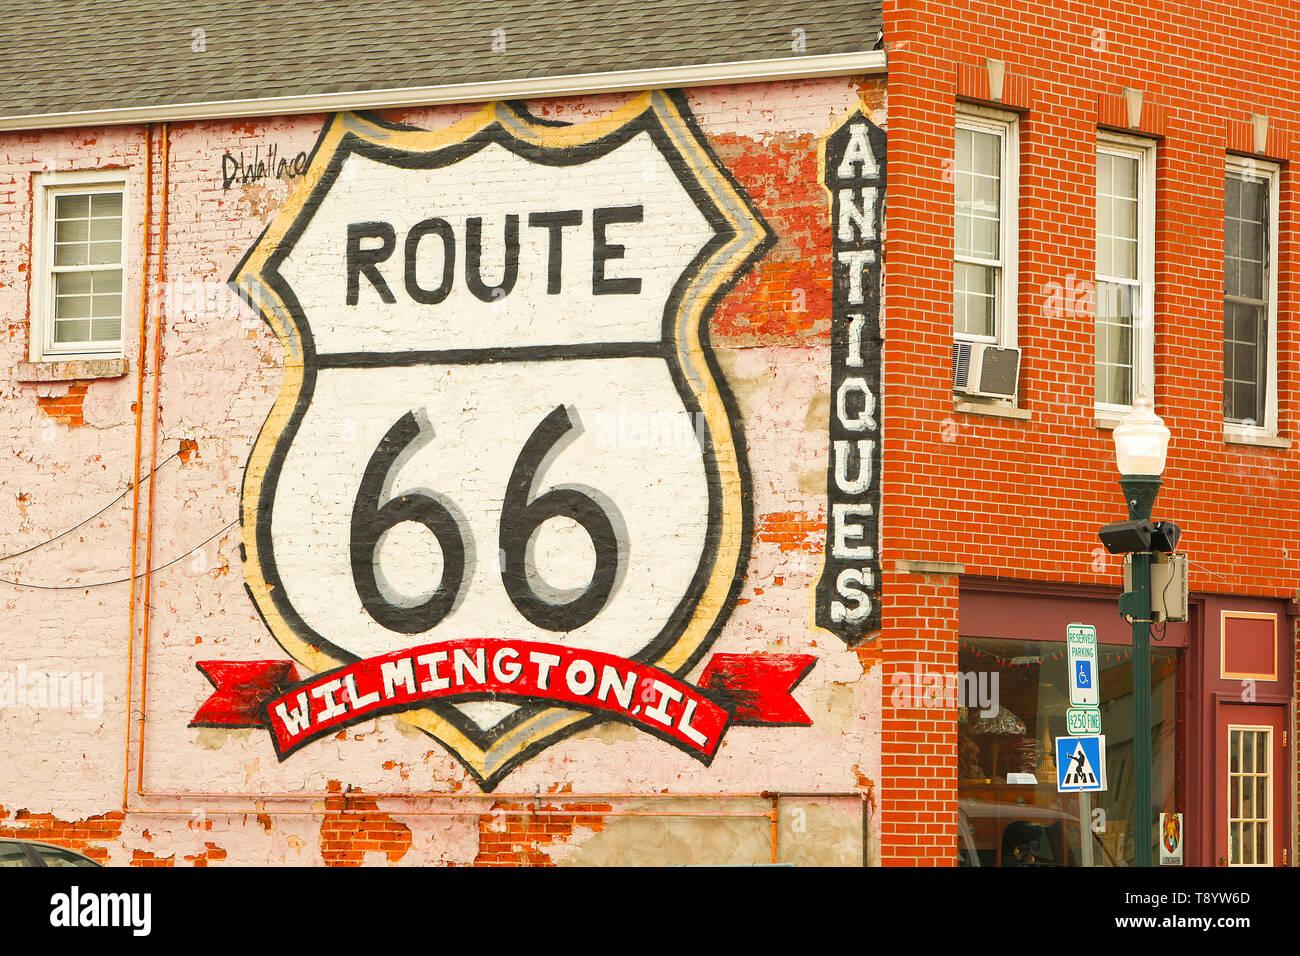 Route 66 Roadside Attraction Stock Photo